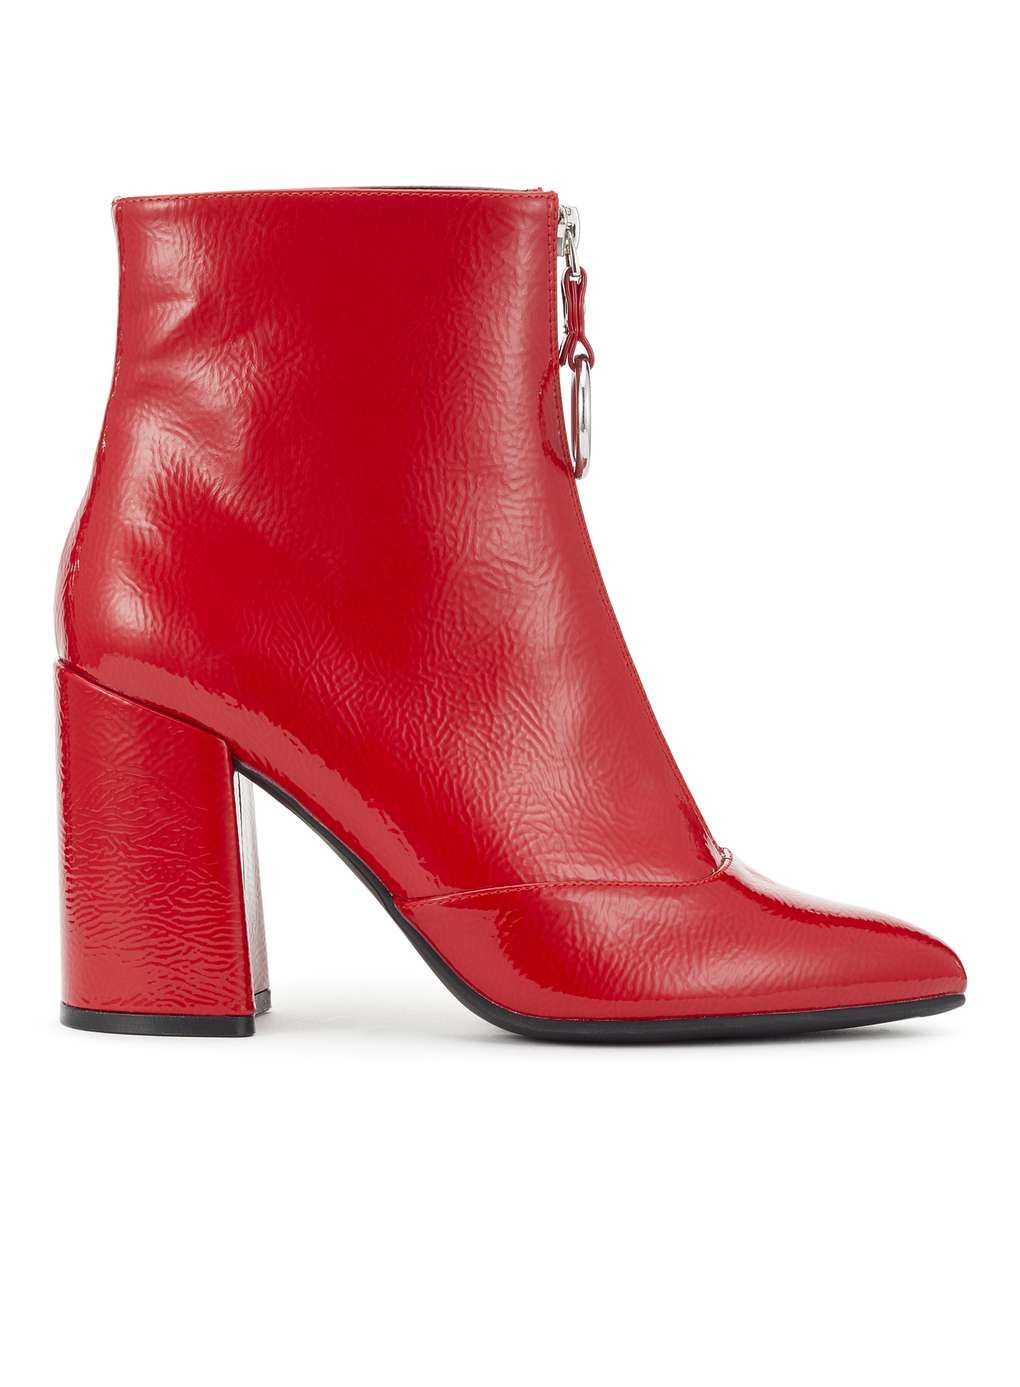 d49c9ecb6b1a 11 9 17 Darla crinkle red boots